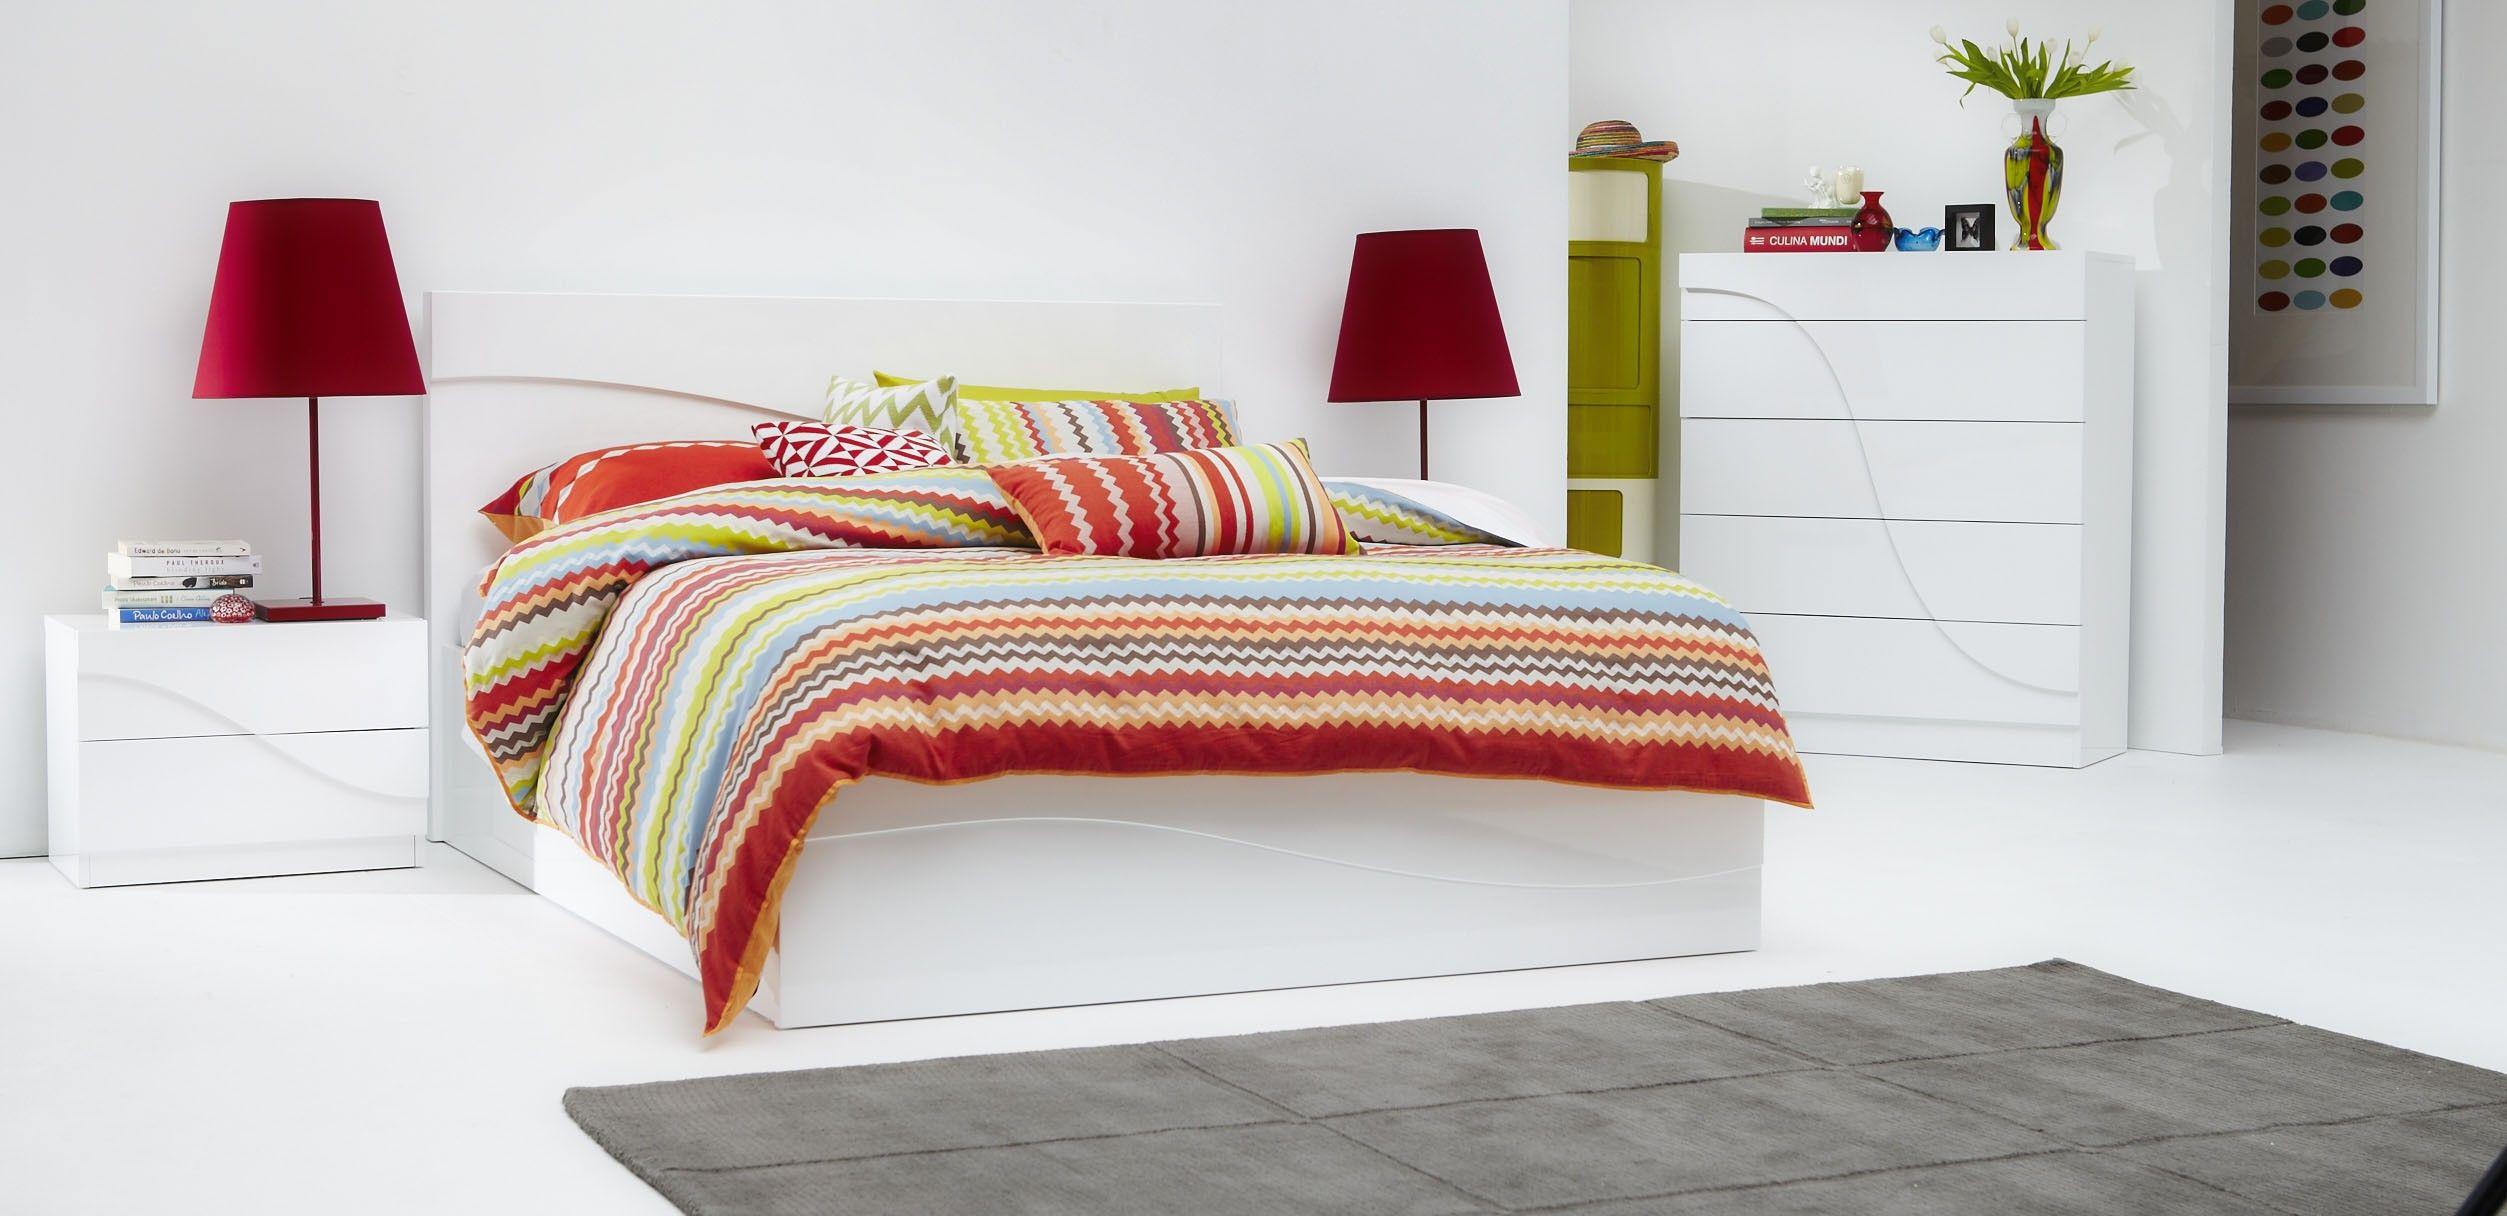 Jericho Bedroom Furniture Leather Bedroom Suite Sumptuous